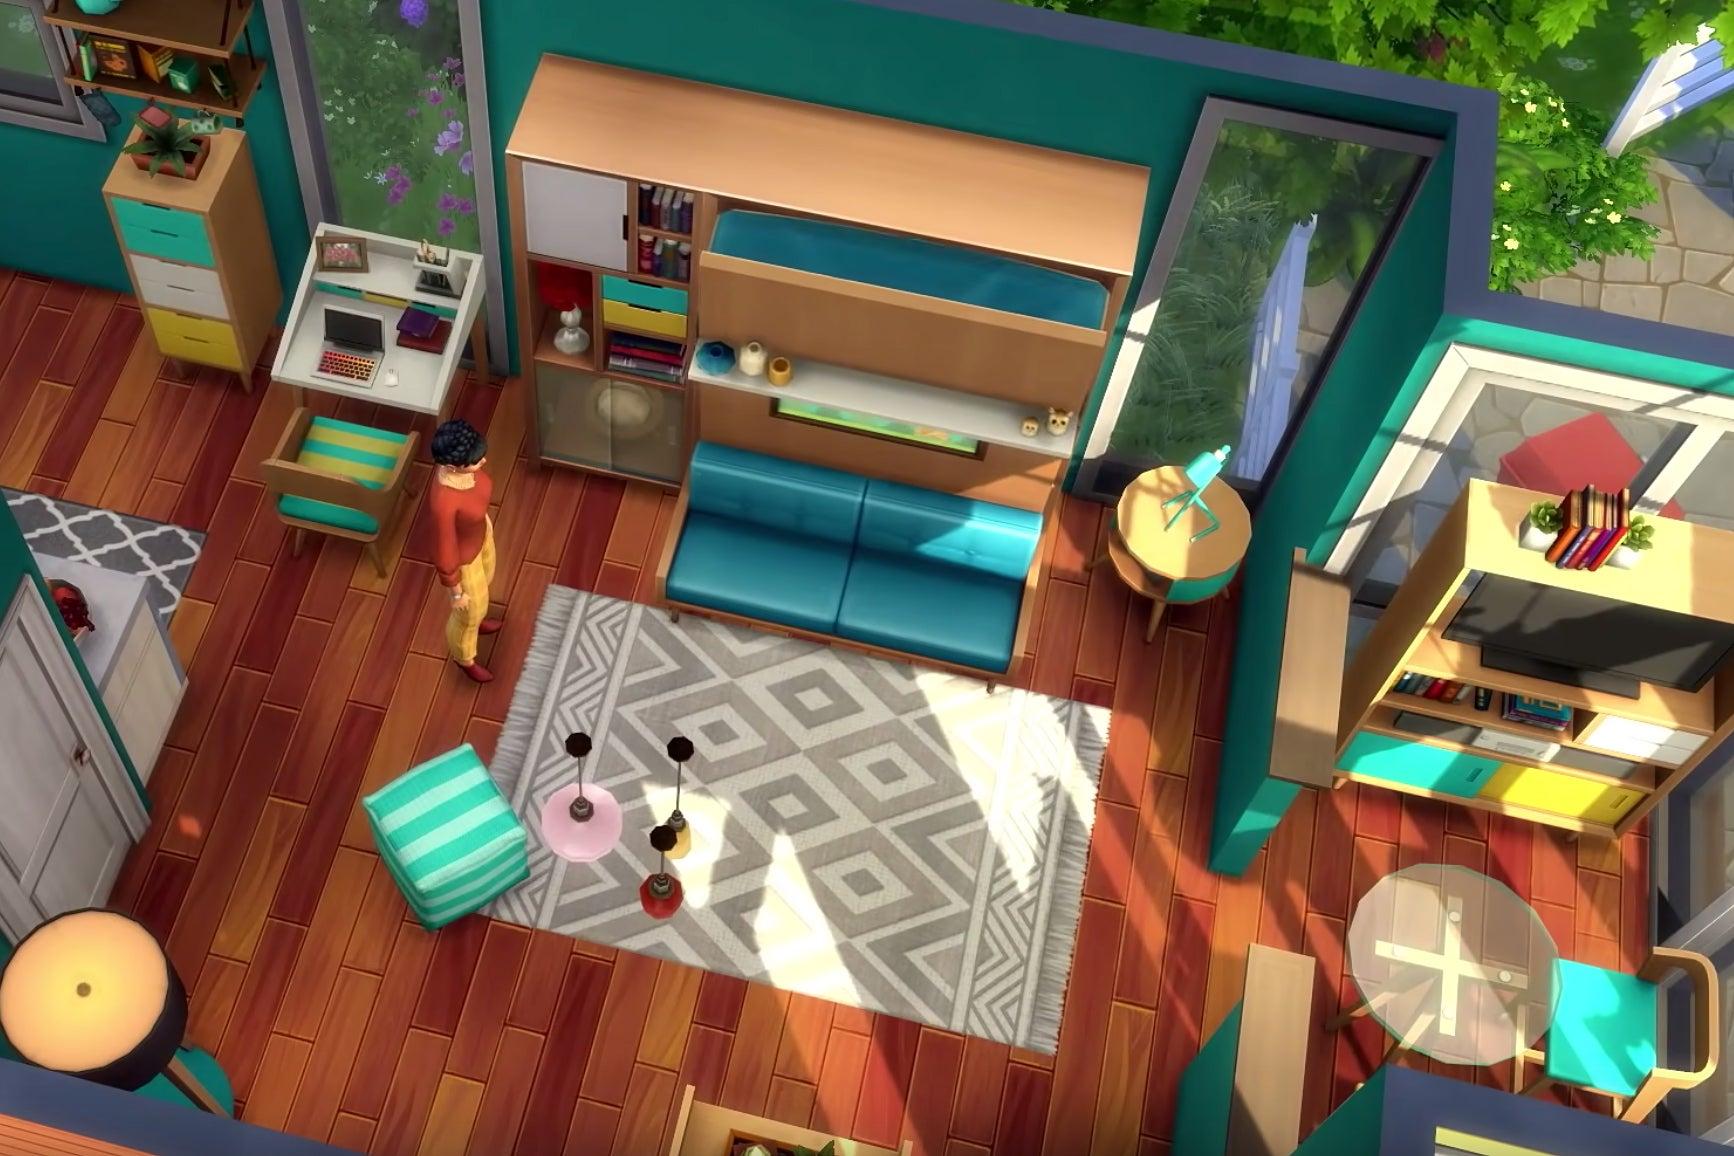 Sims open floor plan interior